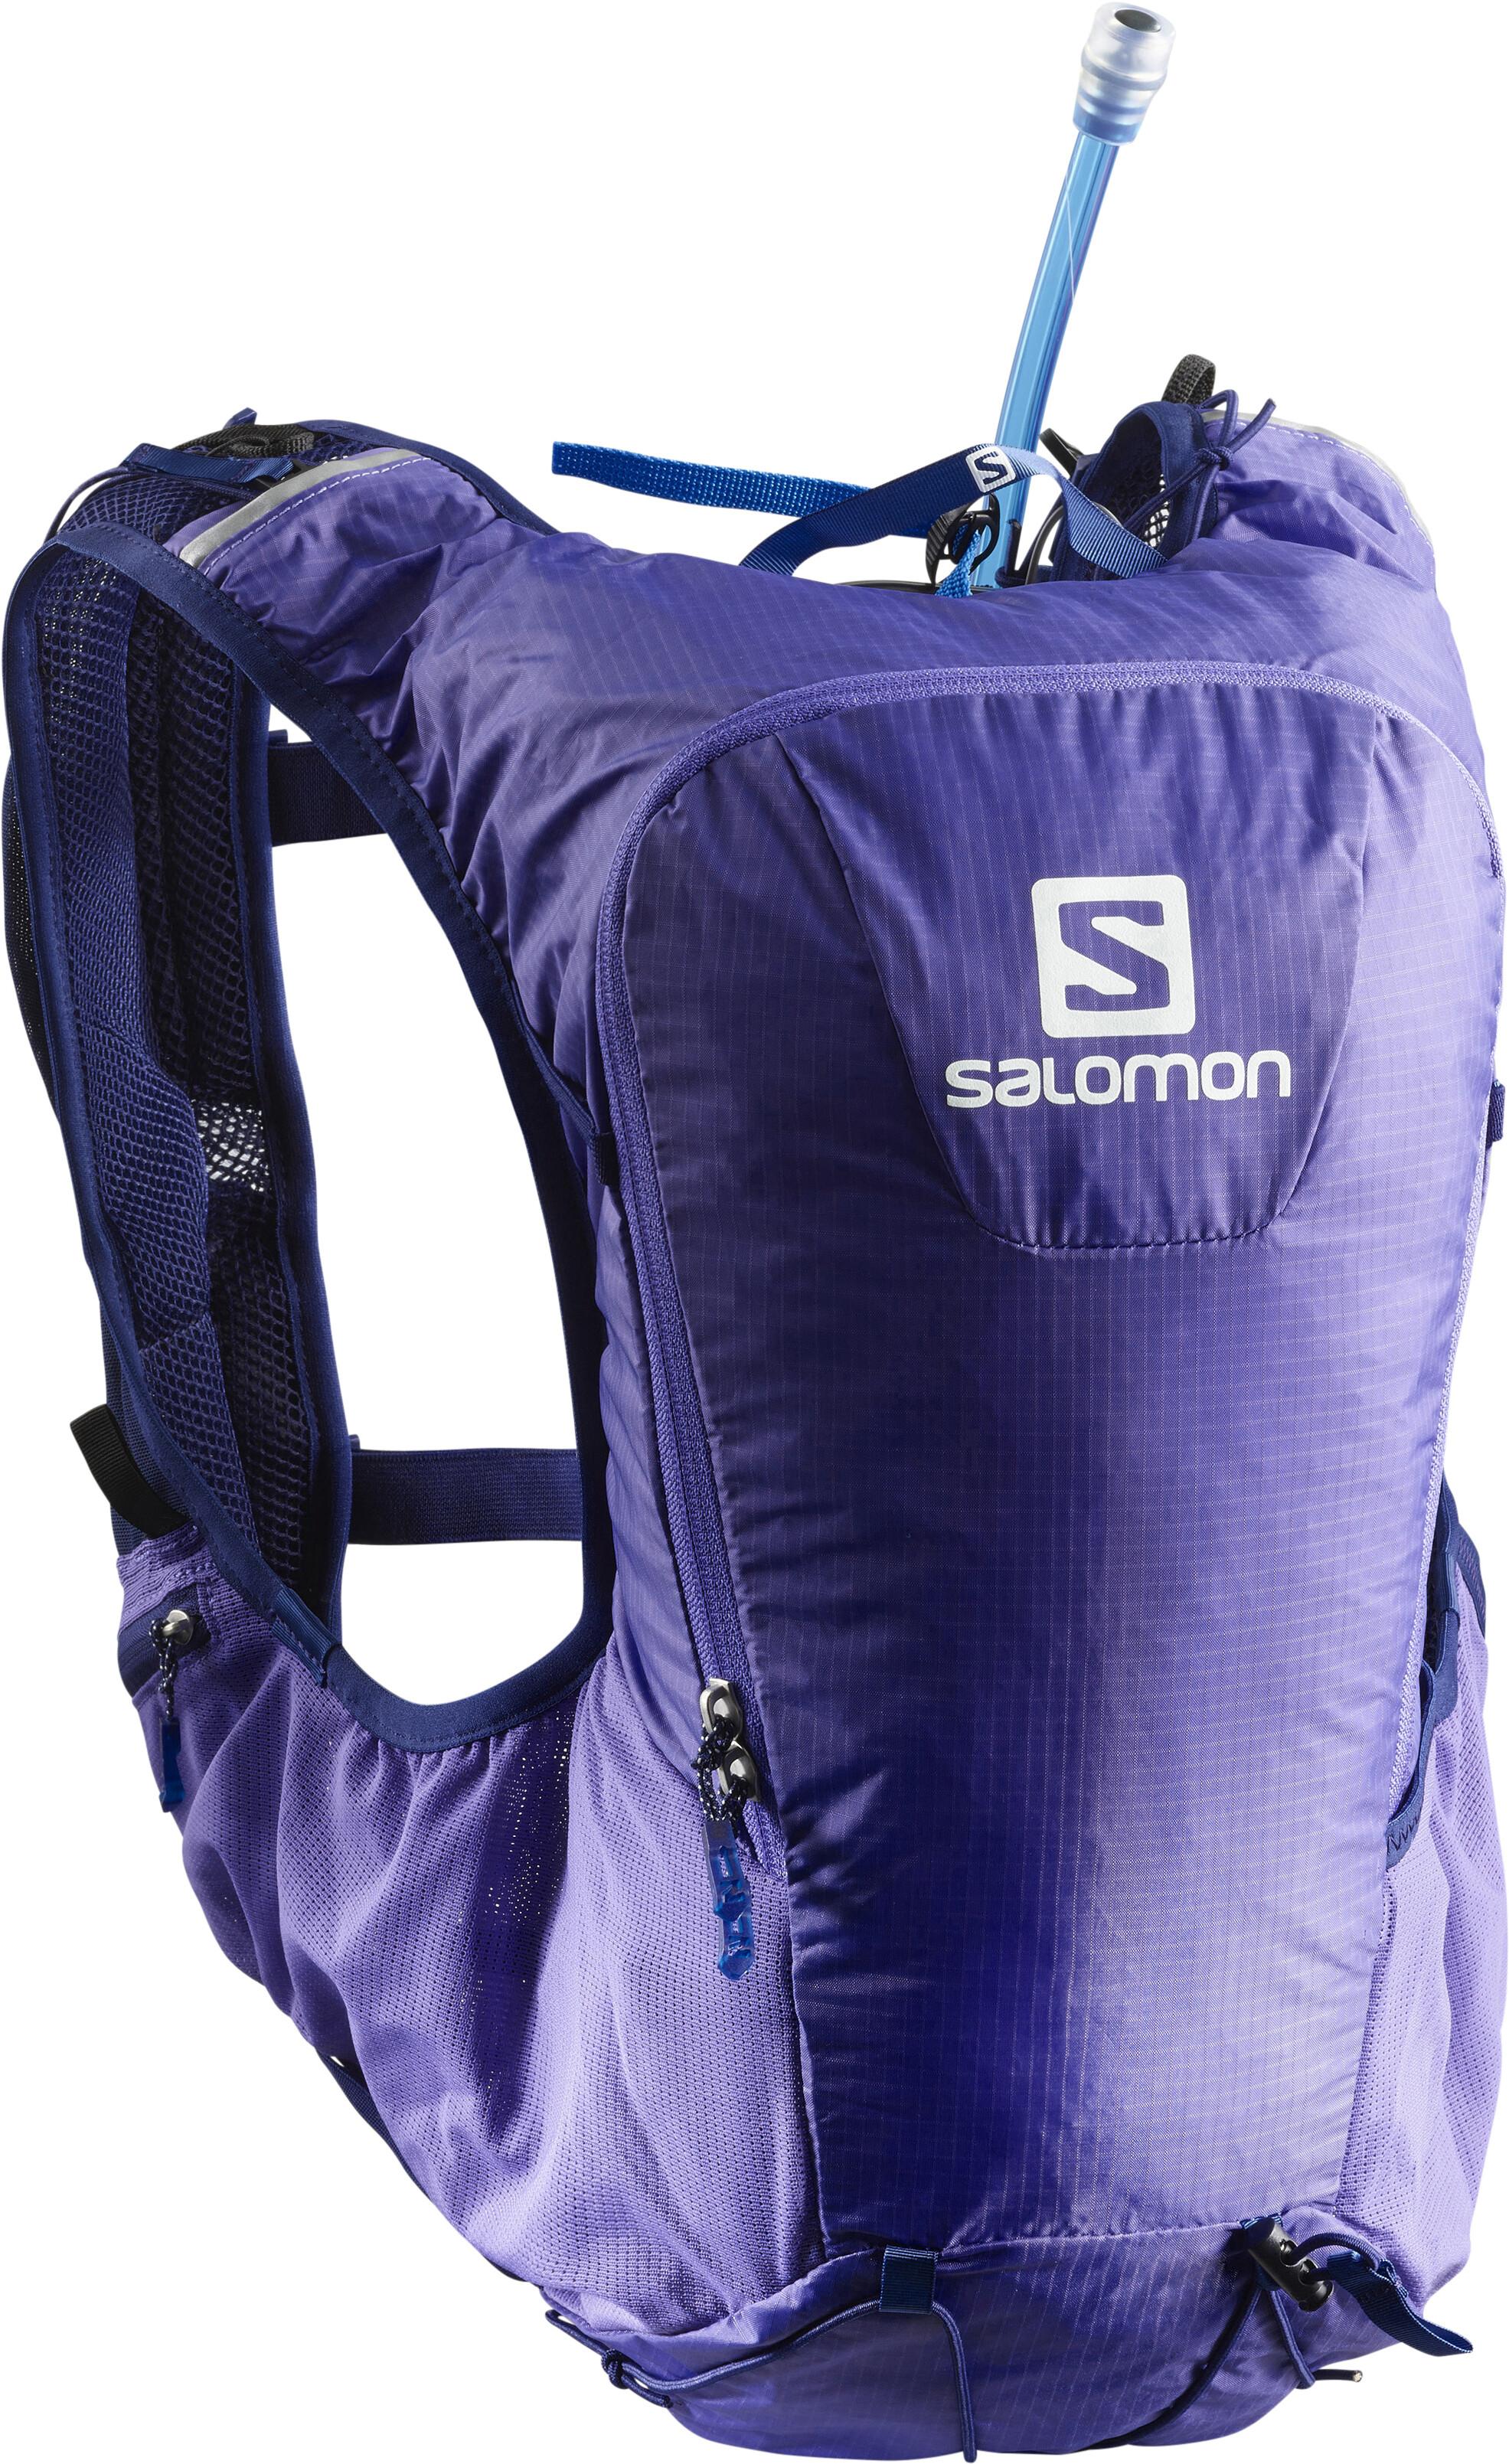 Salomon Skin Pro 10 juomareppu  a9fcc0151a